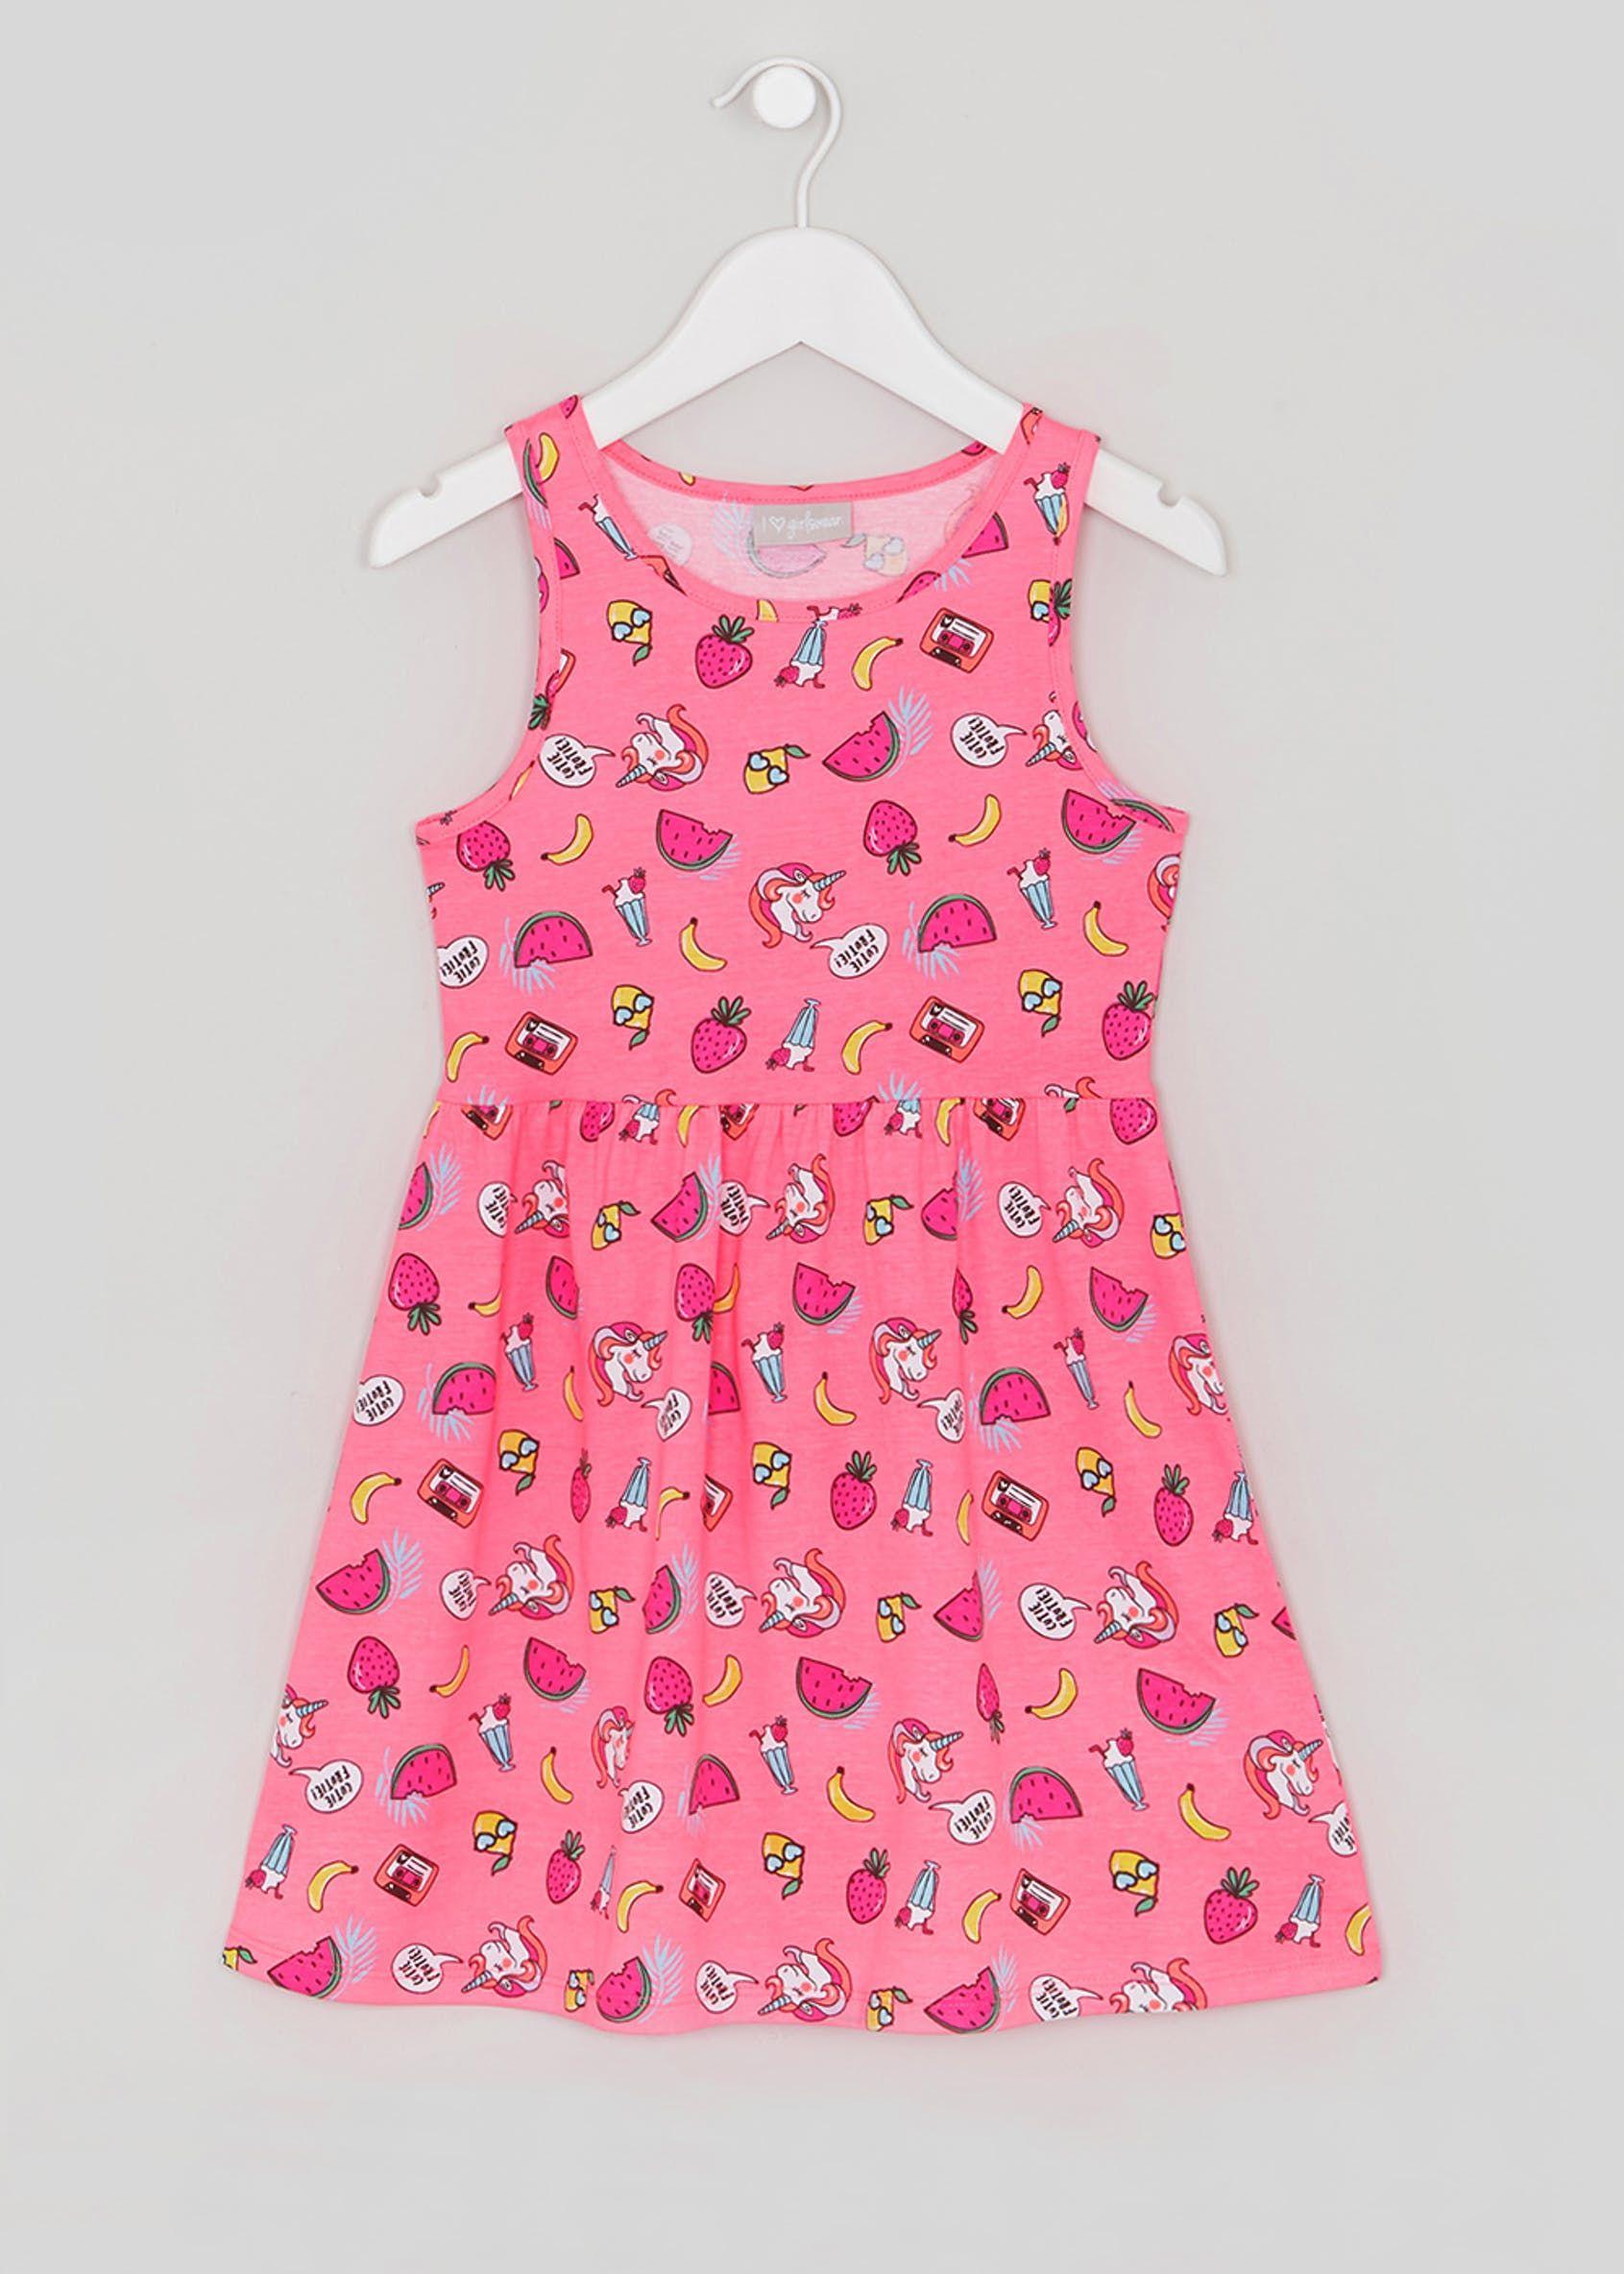 dcbd81fcc851 Girls Unicorn Dress (4-13yrs) – Pink | G I R L S - P R I N T S ...